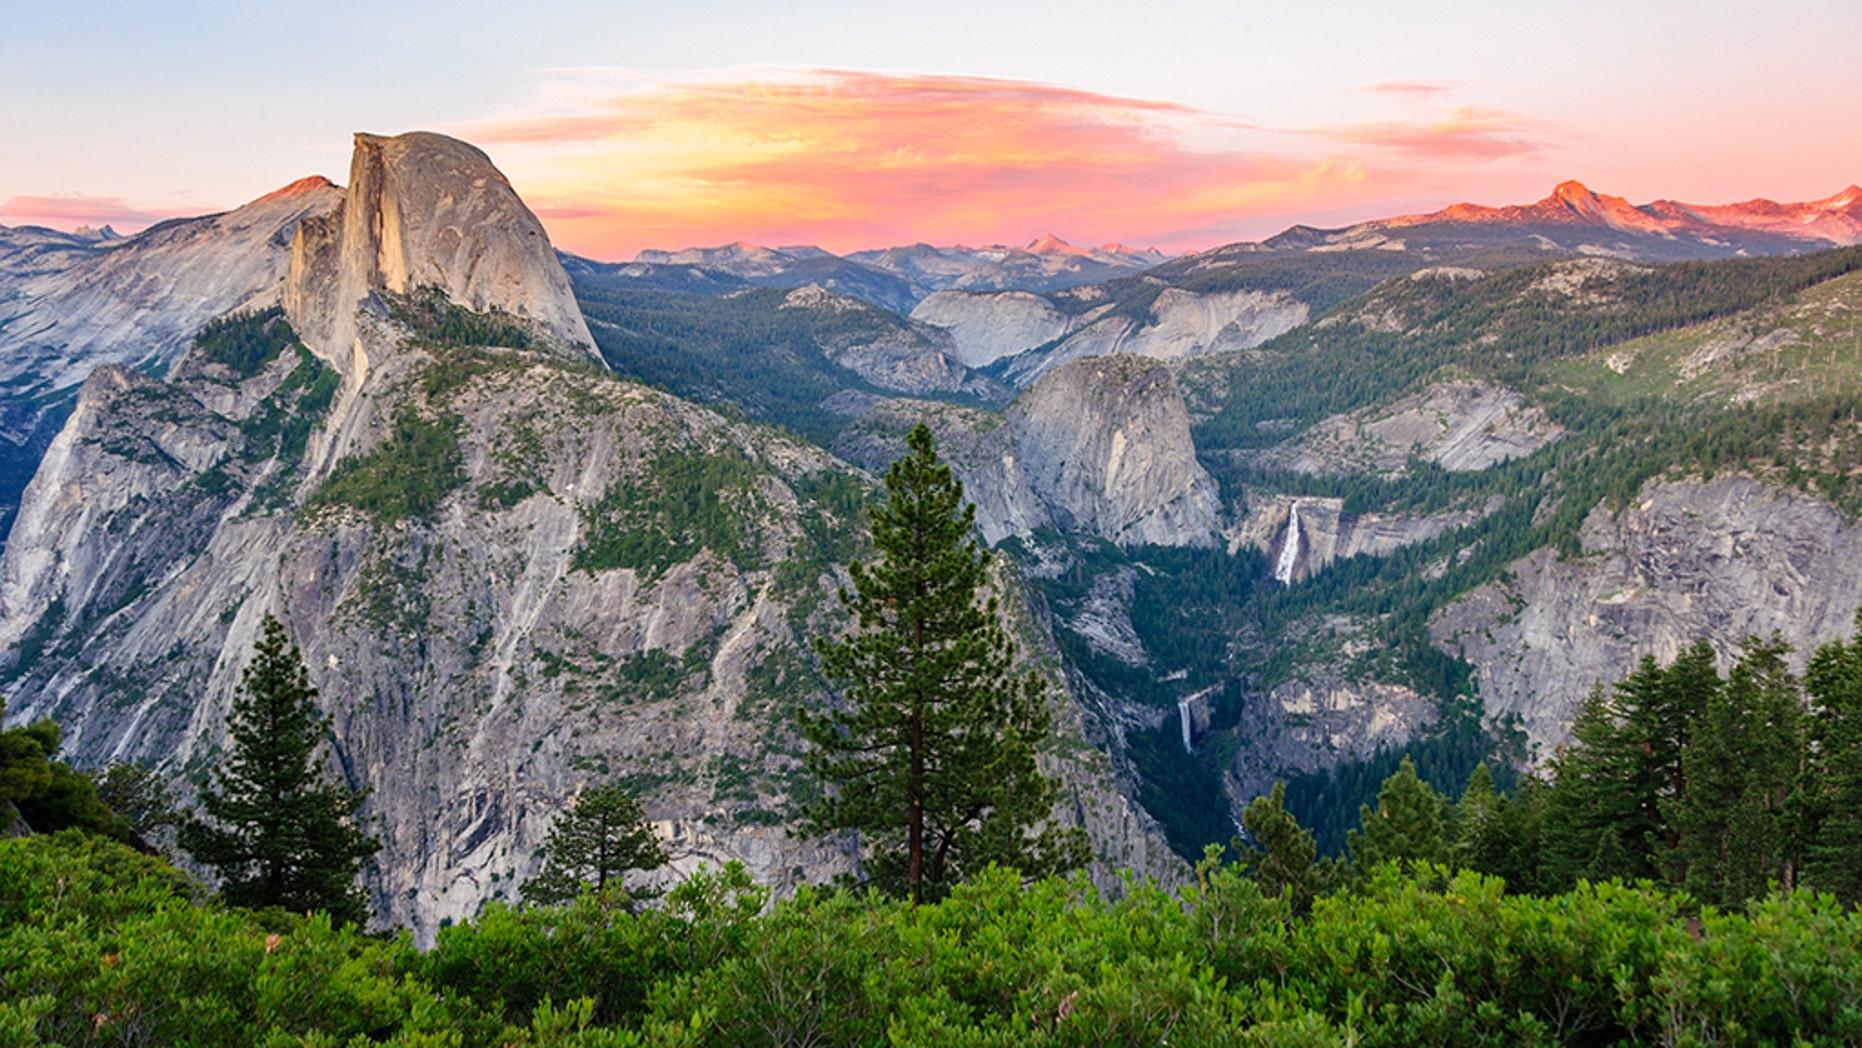 Shutdown delays investigation of man's death at Yosemite